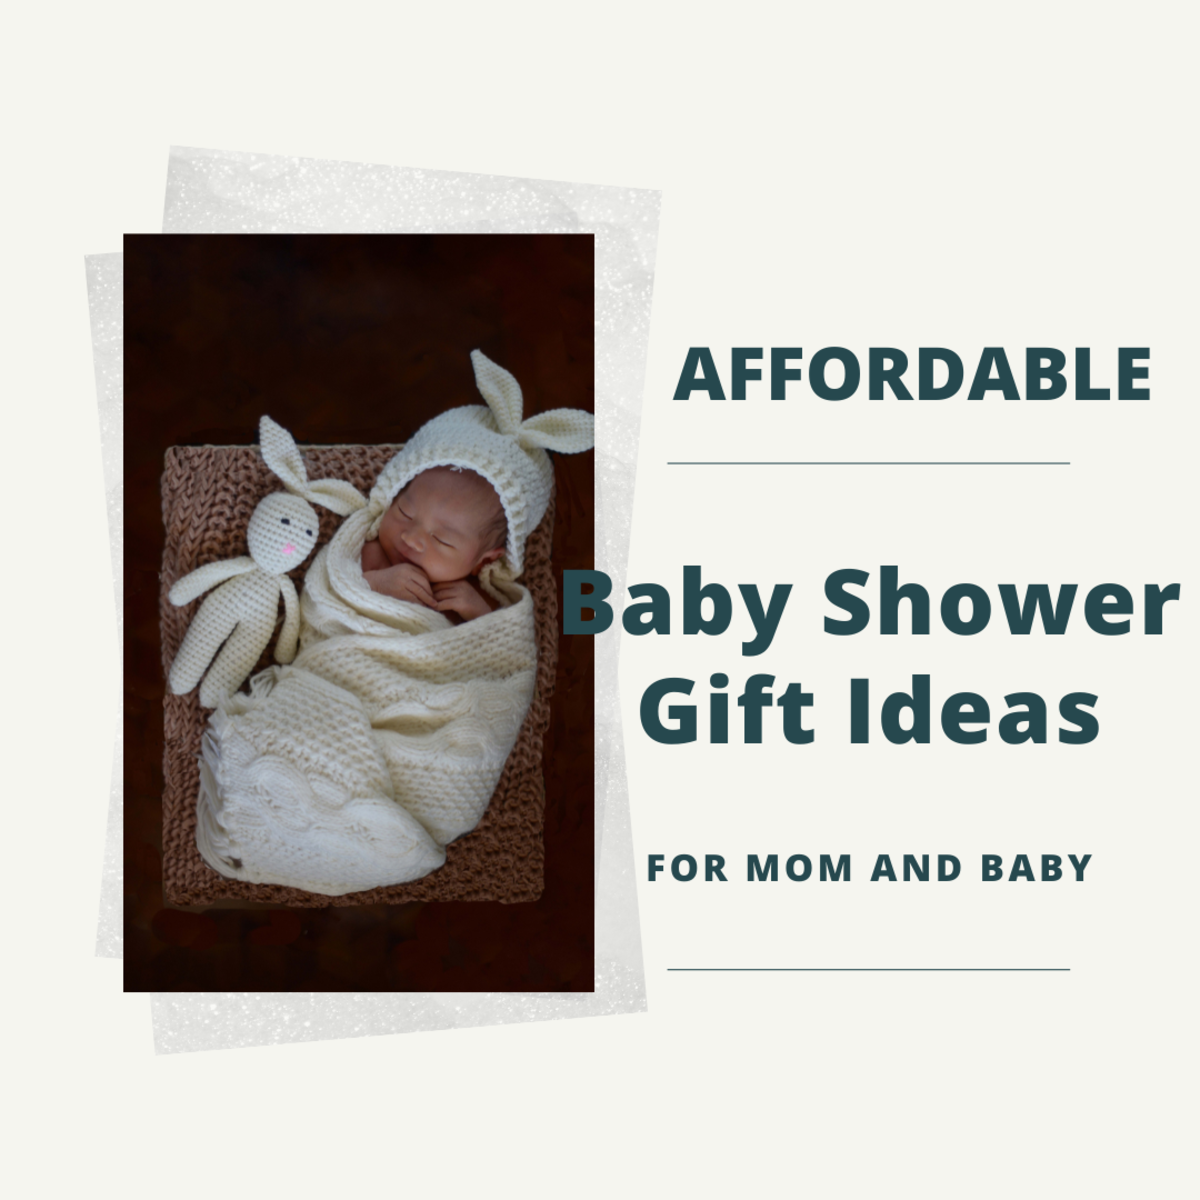 Baby shower gift ideas.